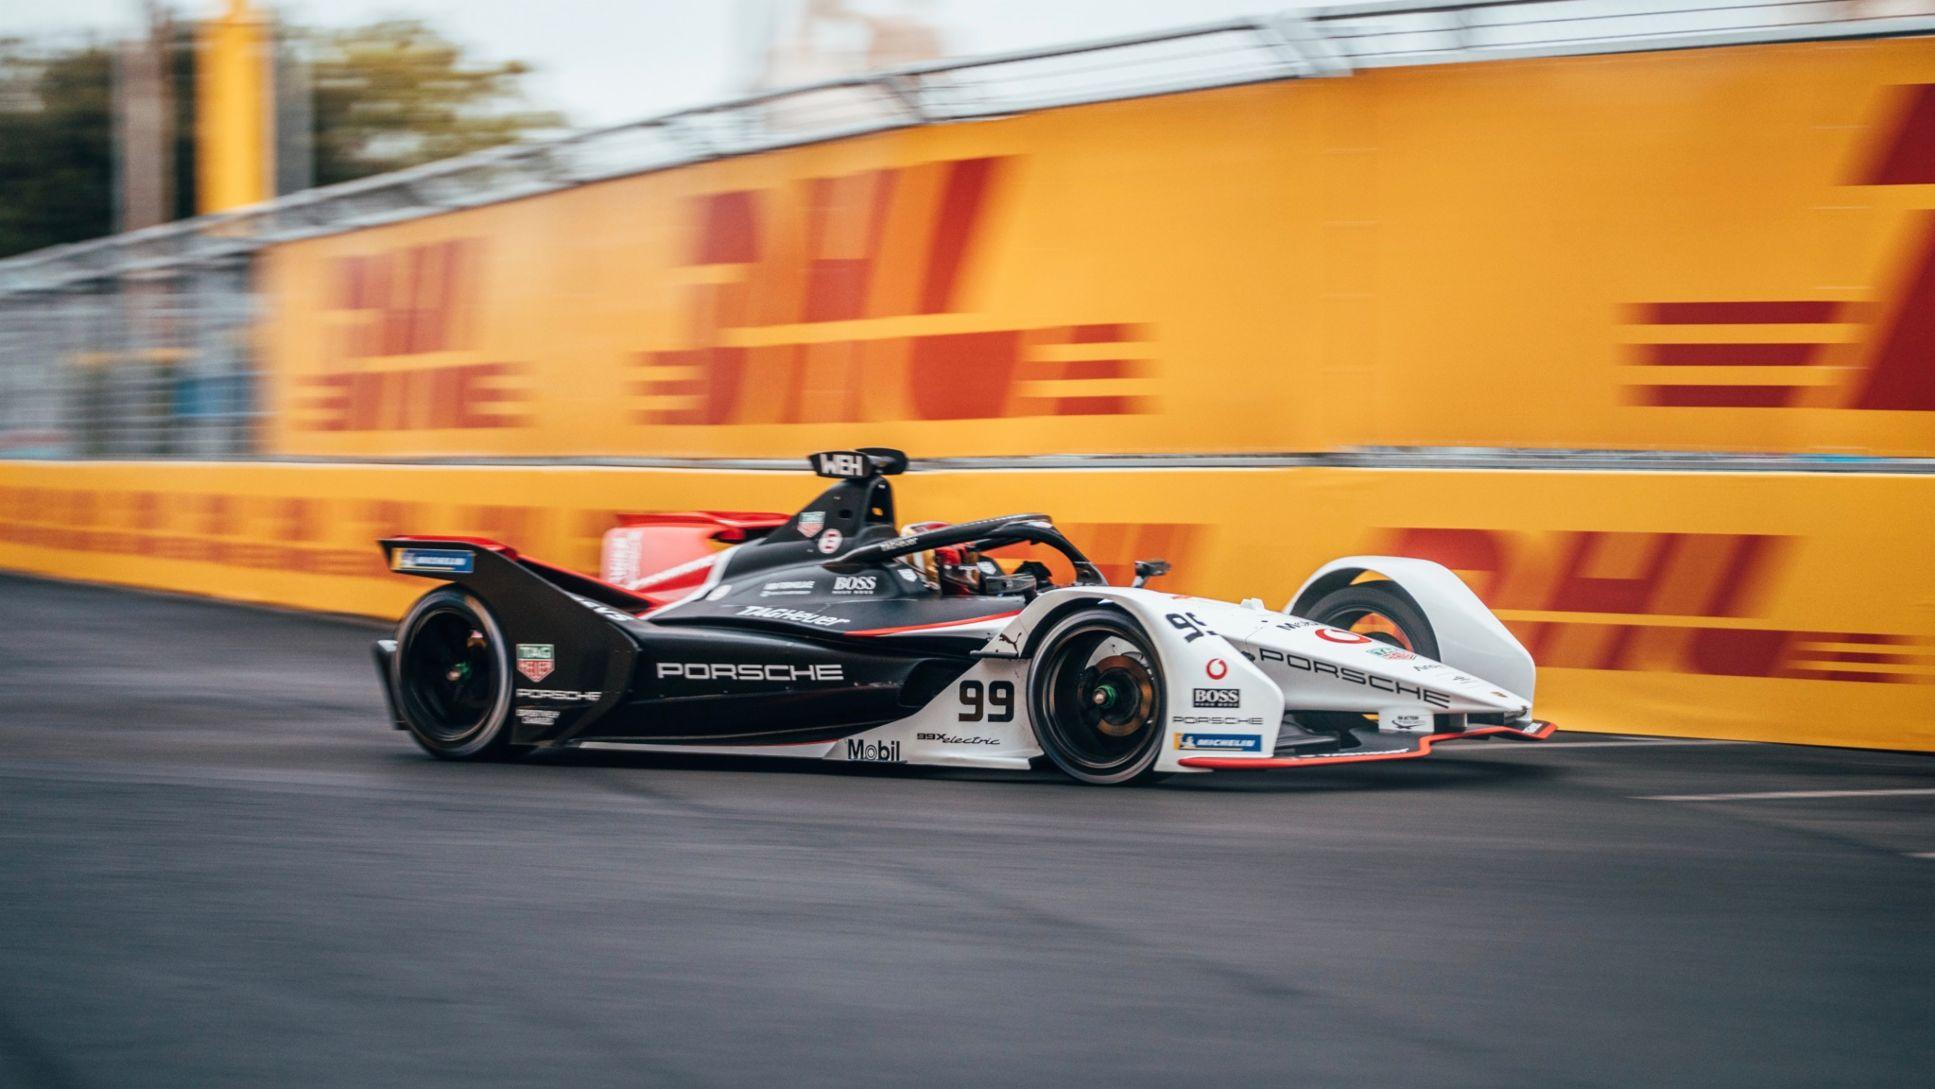 TAG Heuer Porsche Formula E Team aims to continue upward trend in Valencia - Image 4